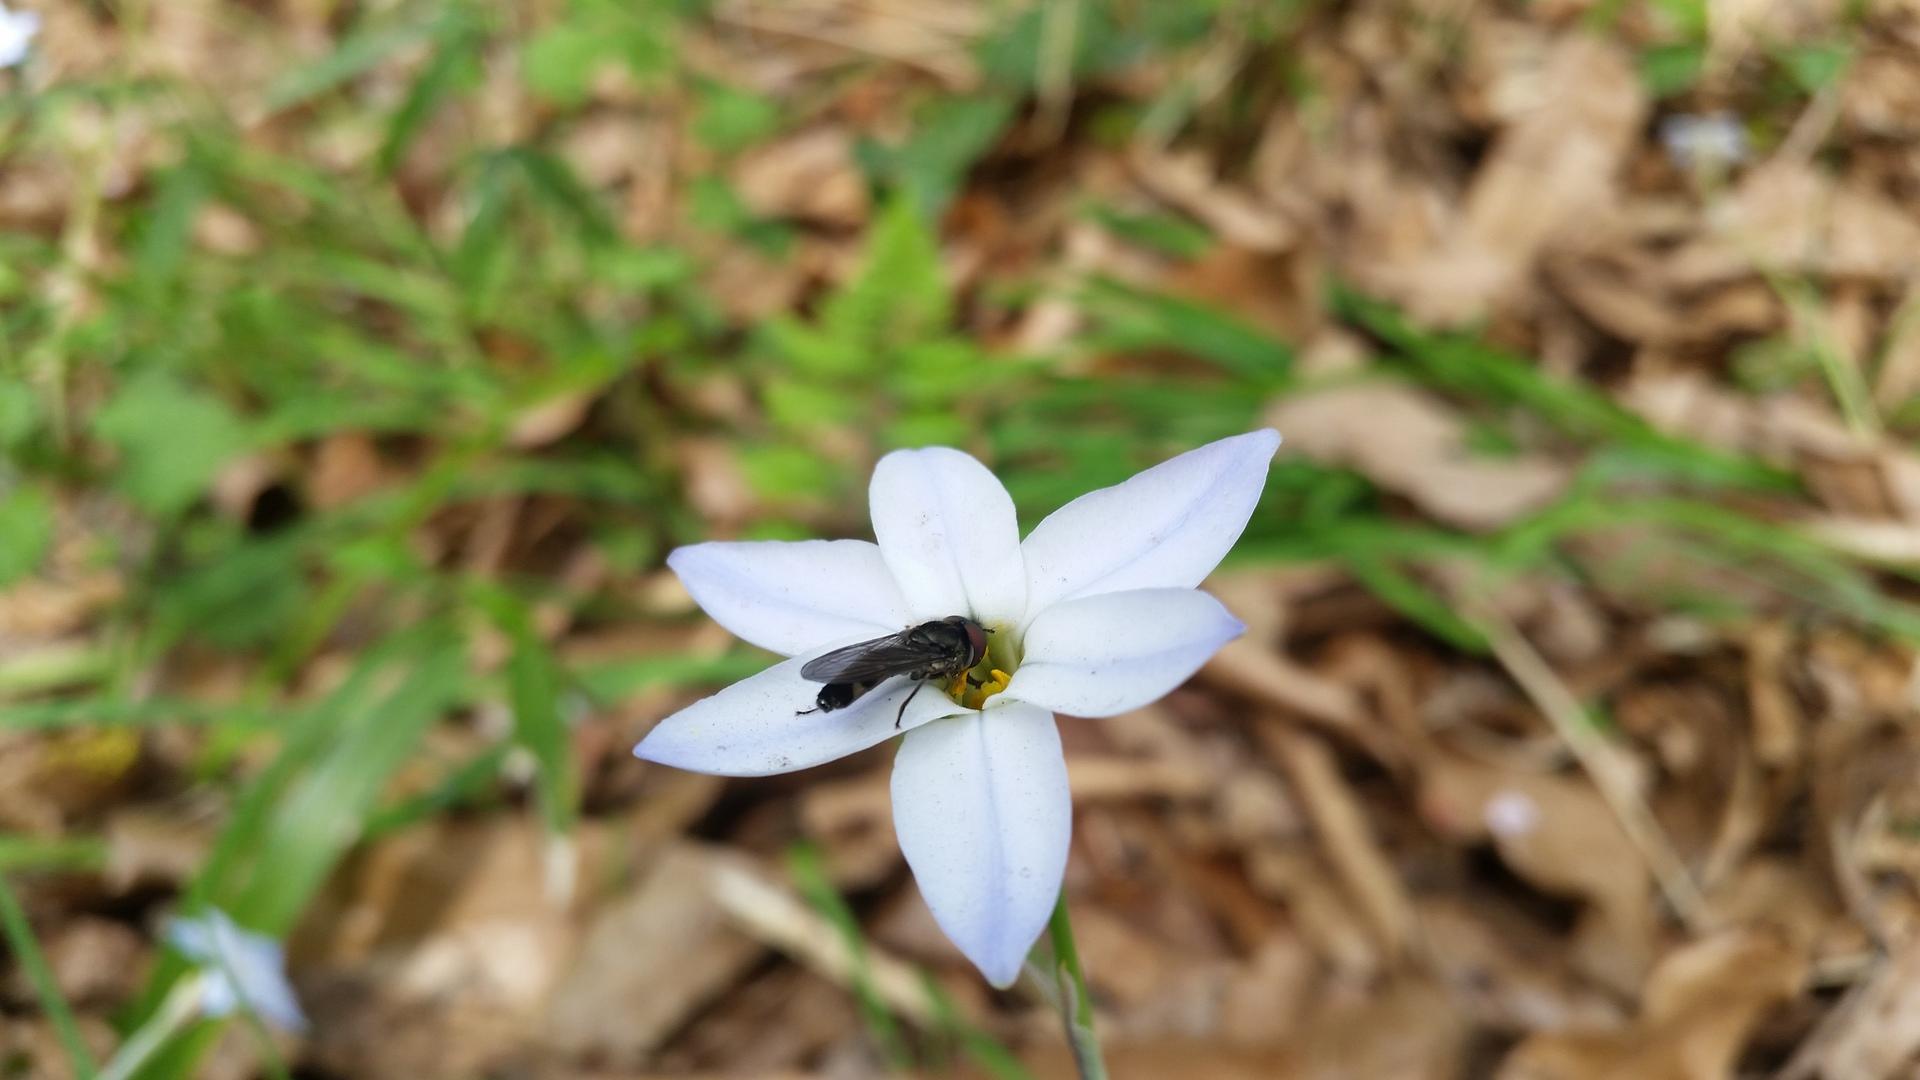 Horse fly | present4_u, bright, close-up, flower